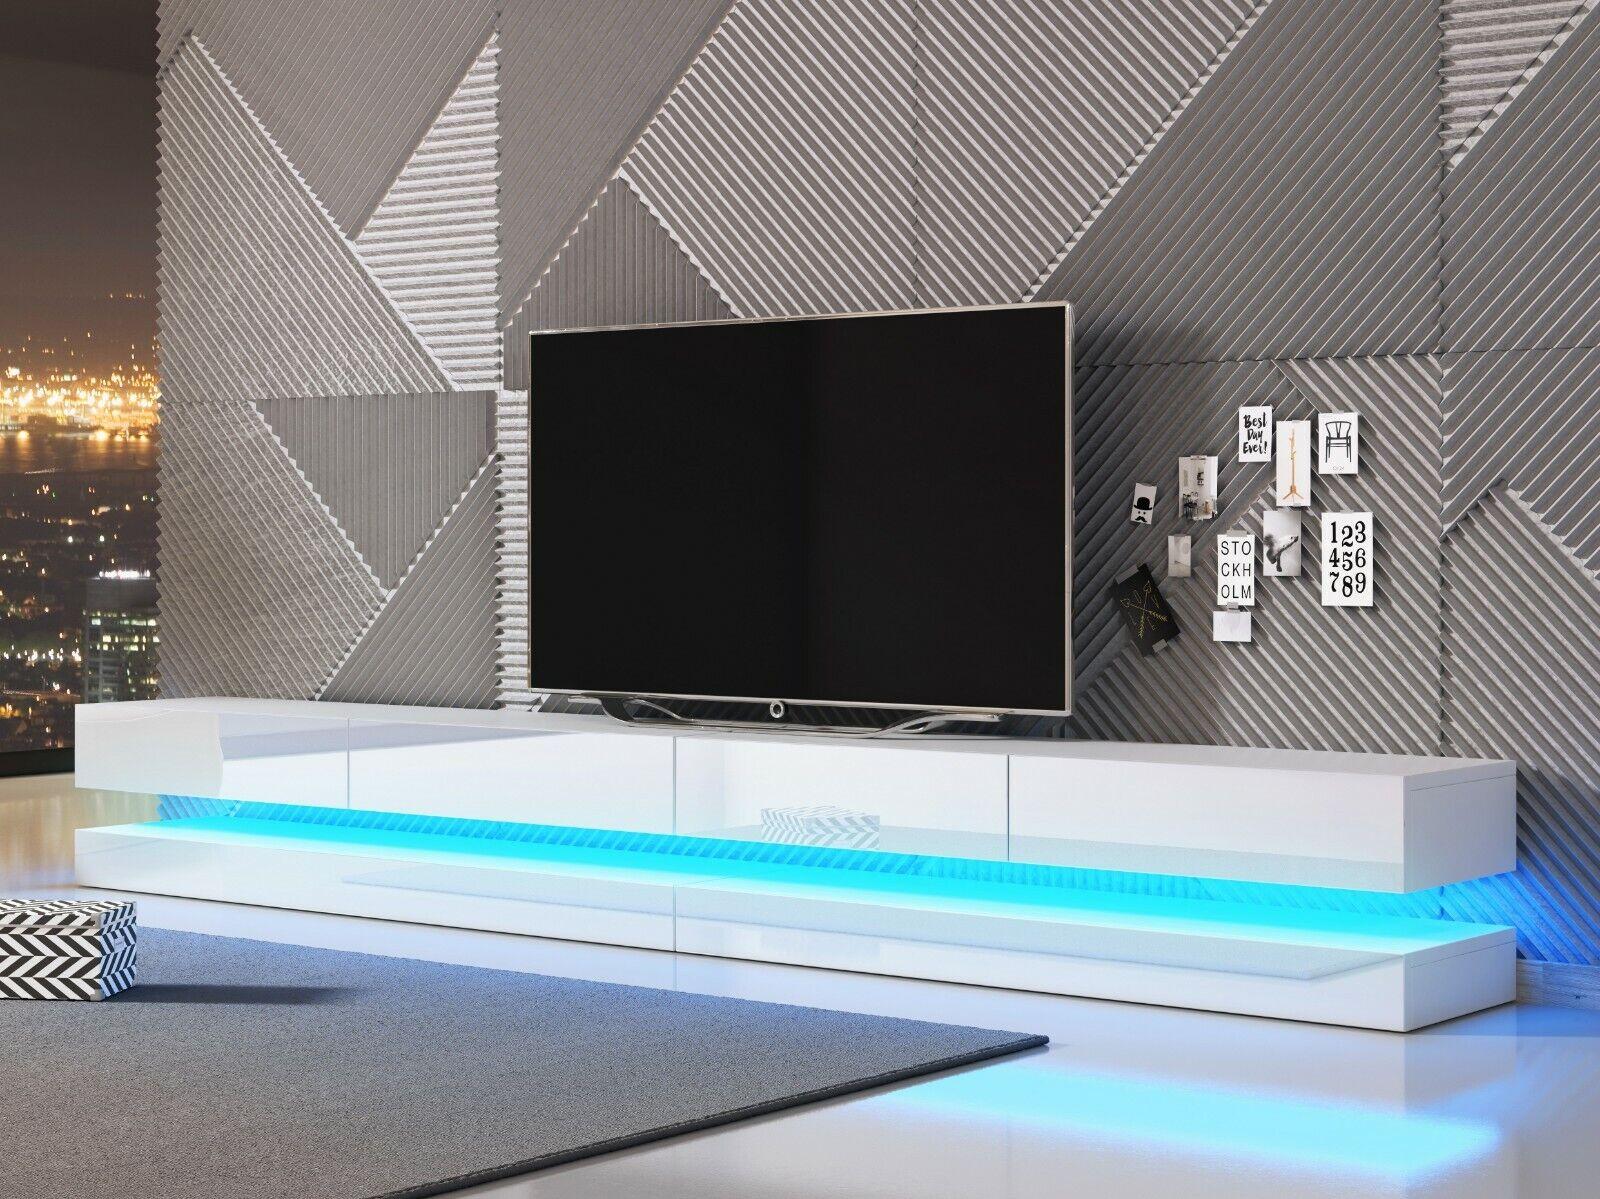 TV Lowboard FLY DOUBLE Fernsehboard Schrank Hängeboard Hängeschrank LED 280 cm